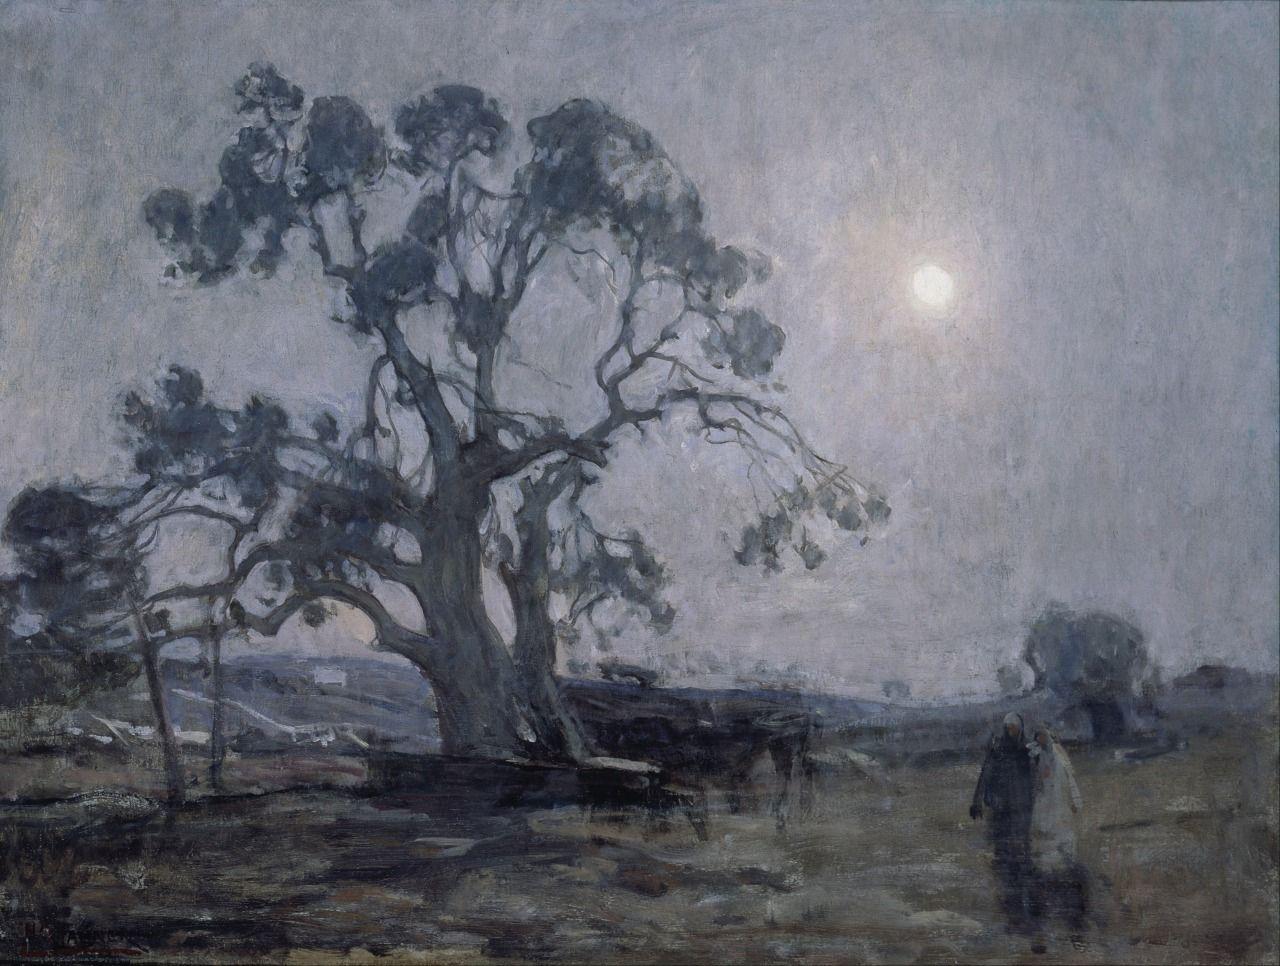 Abraham's Oak, 1905, Henry Ossawa Tanner